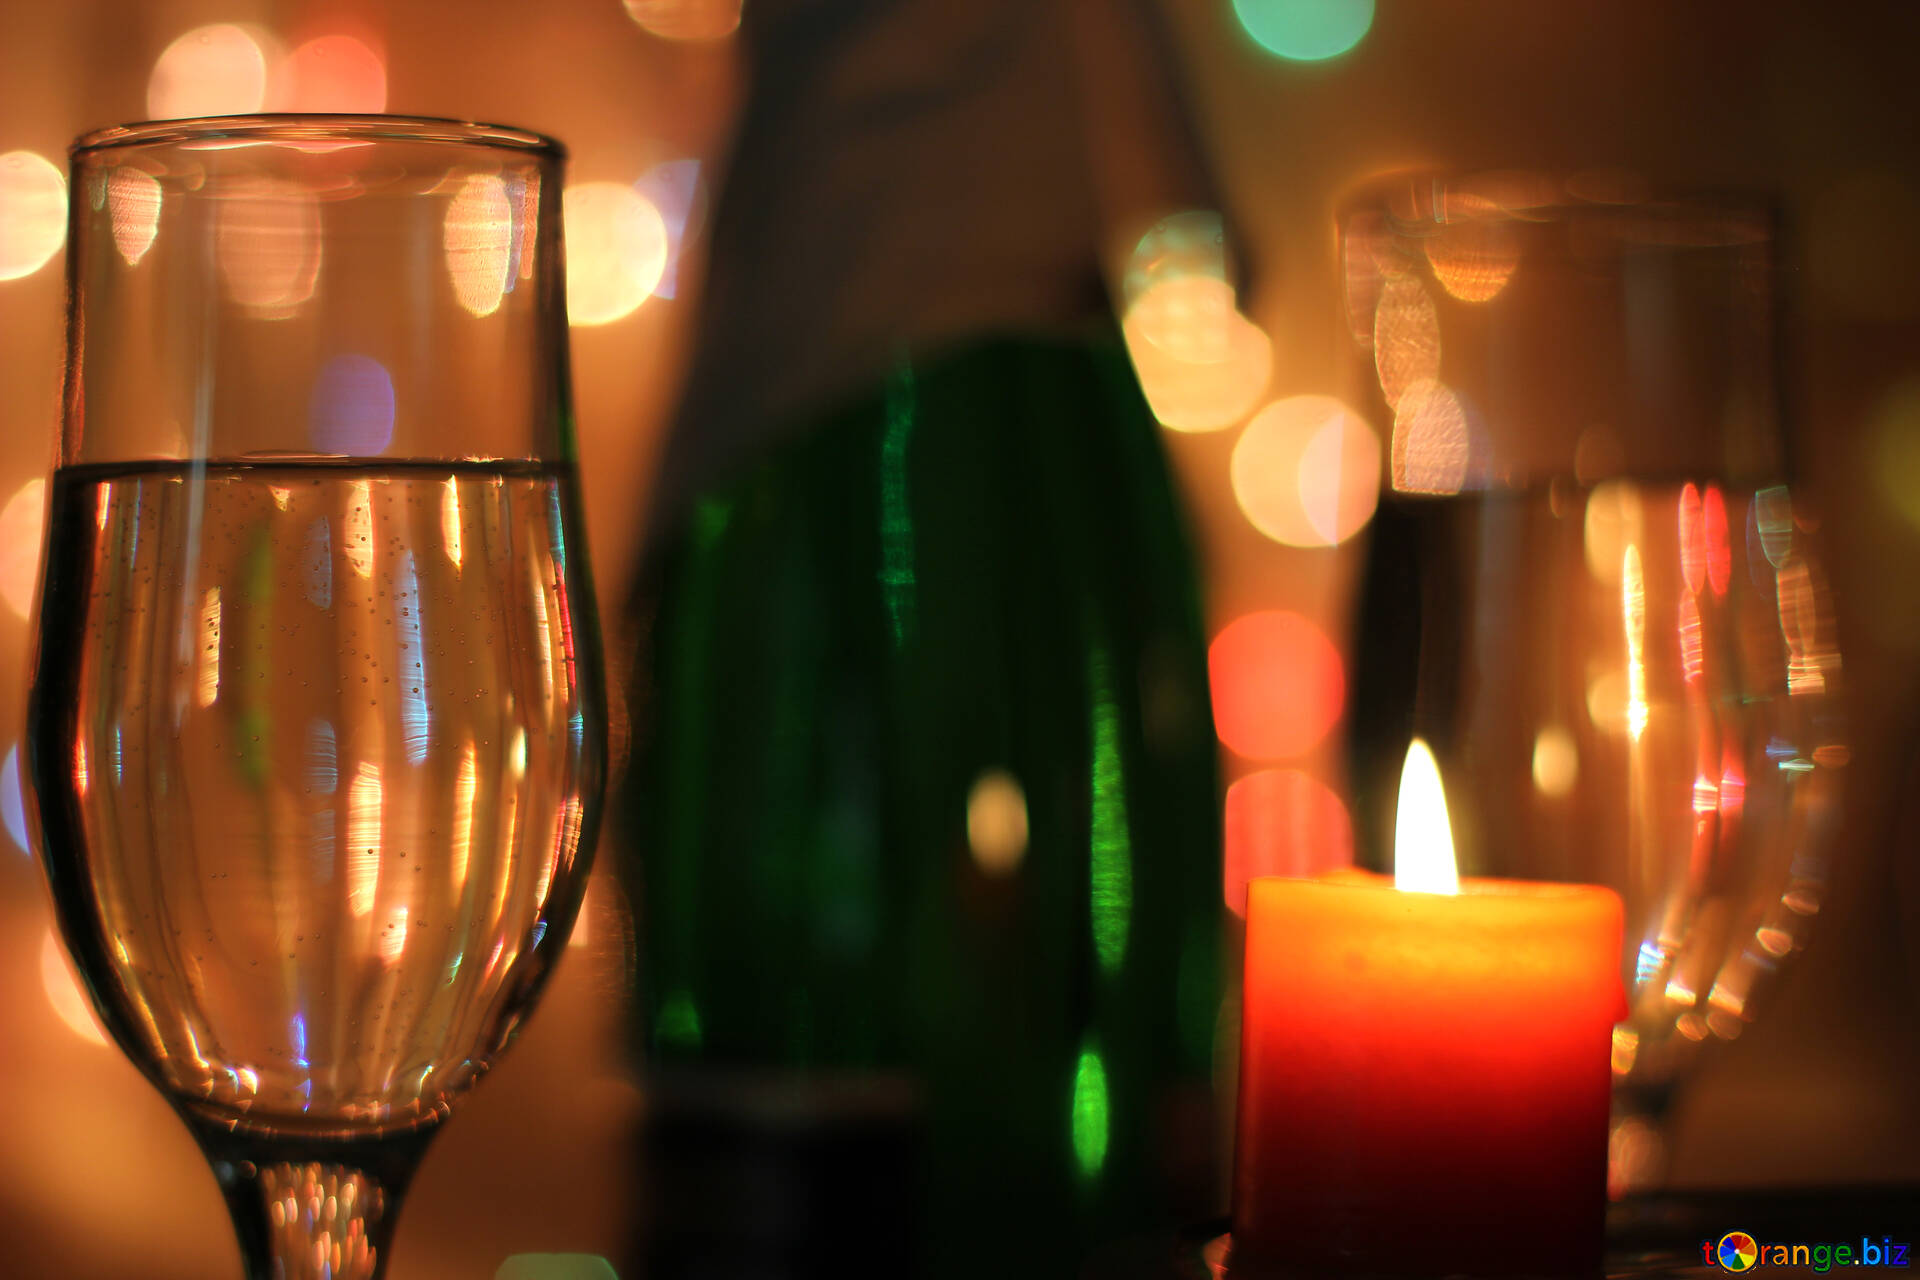 Брату, картинки вечер с шампанским